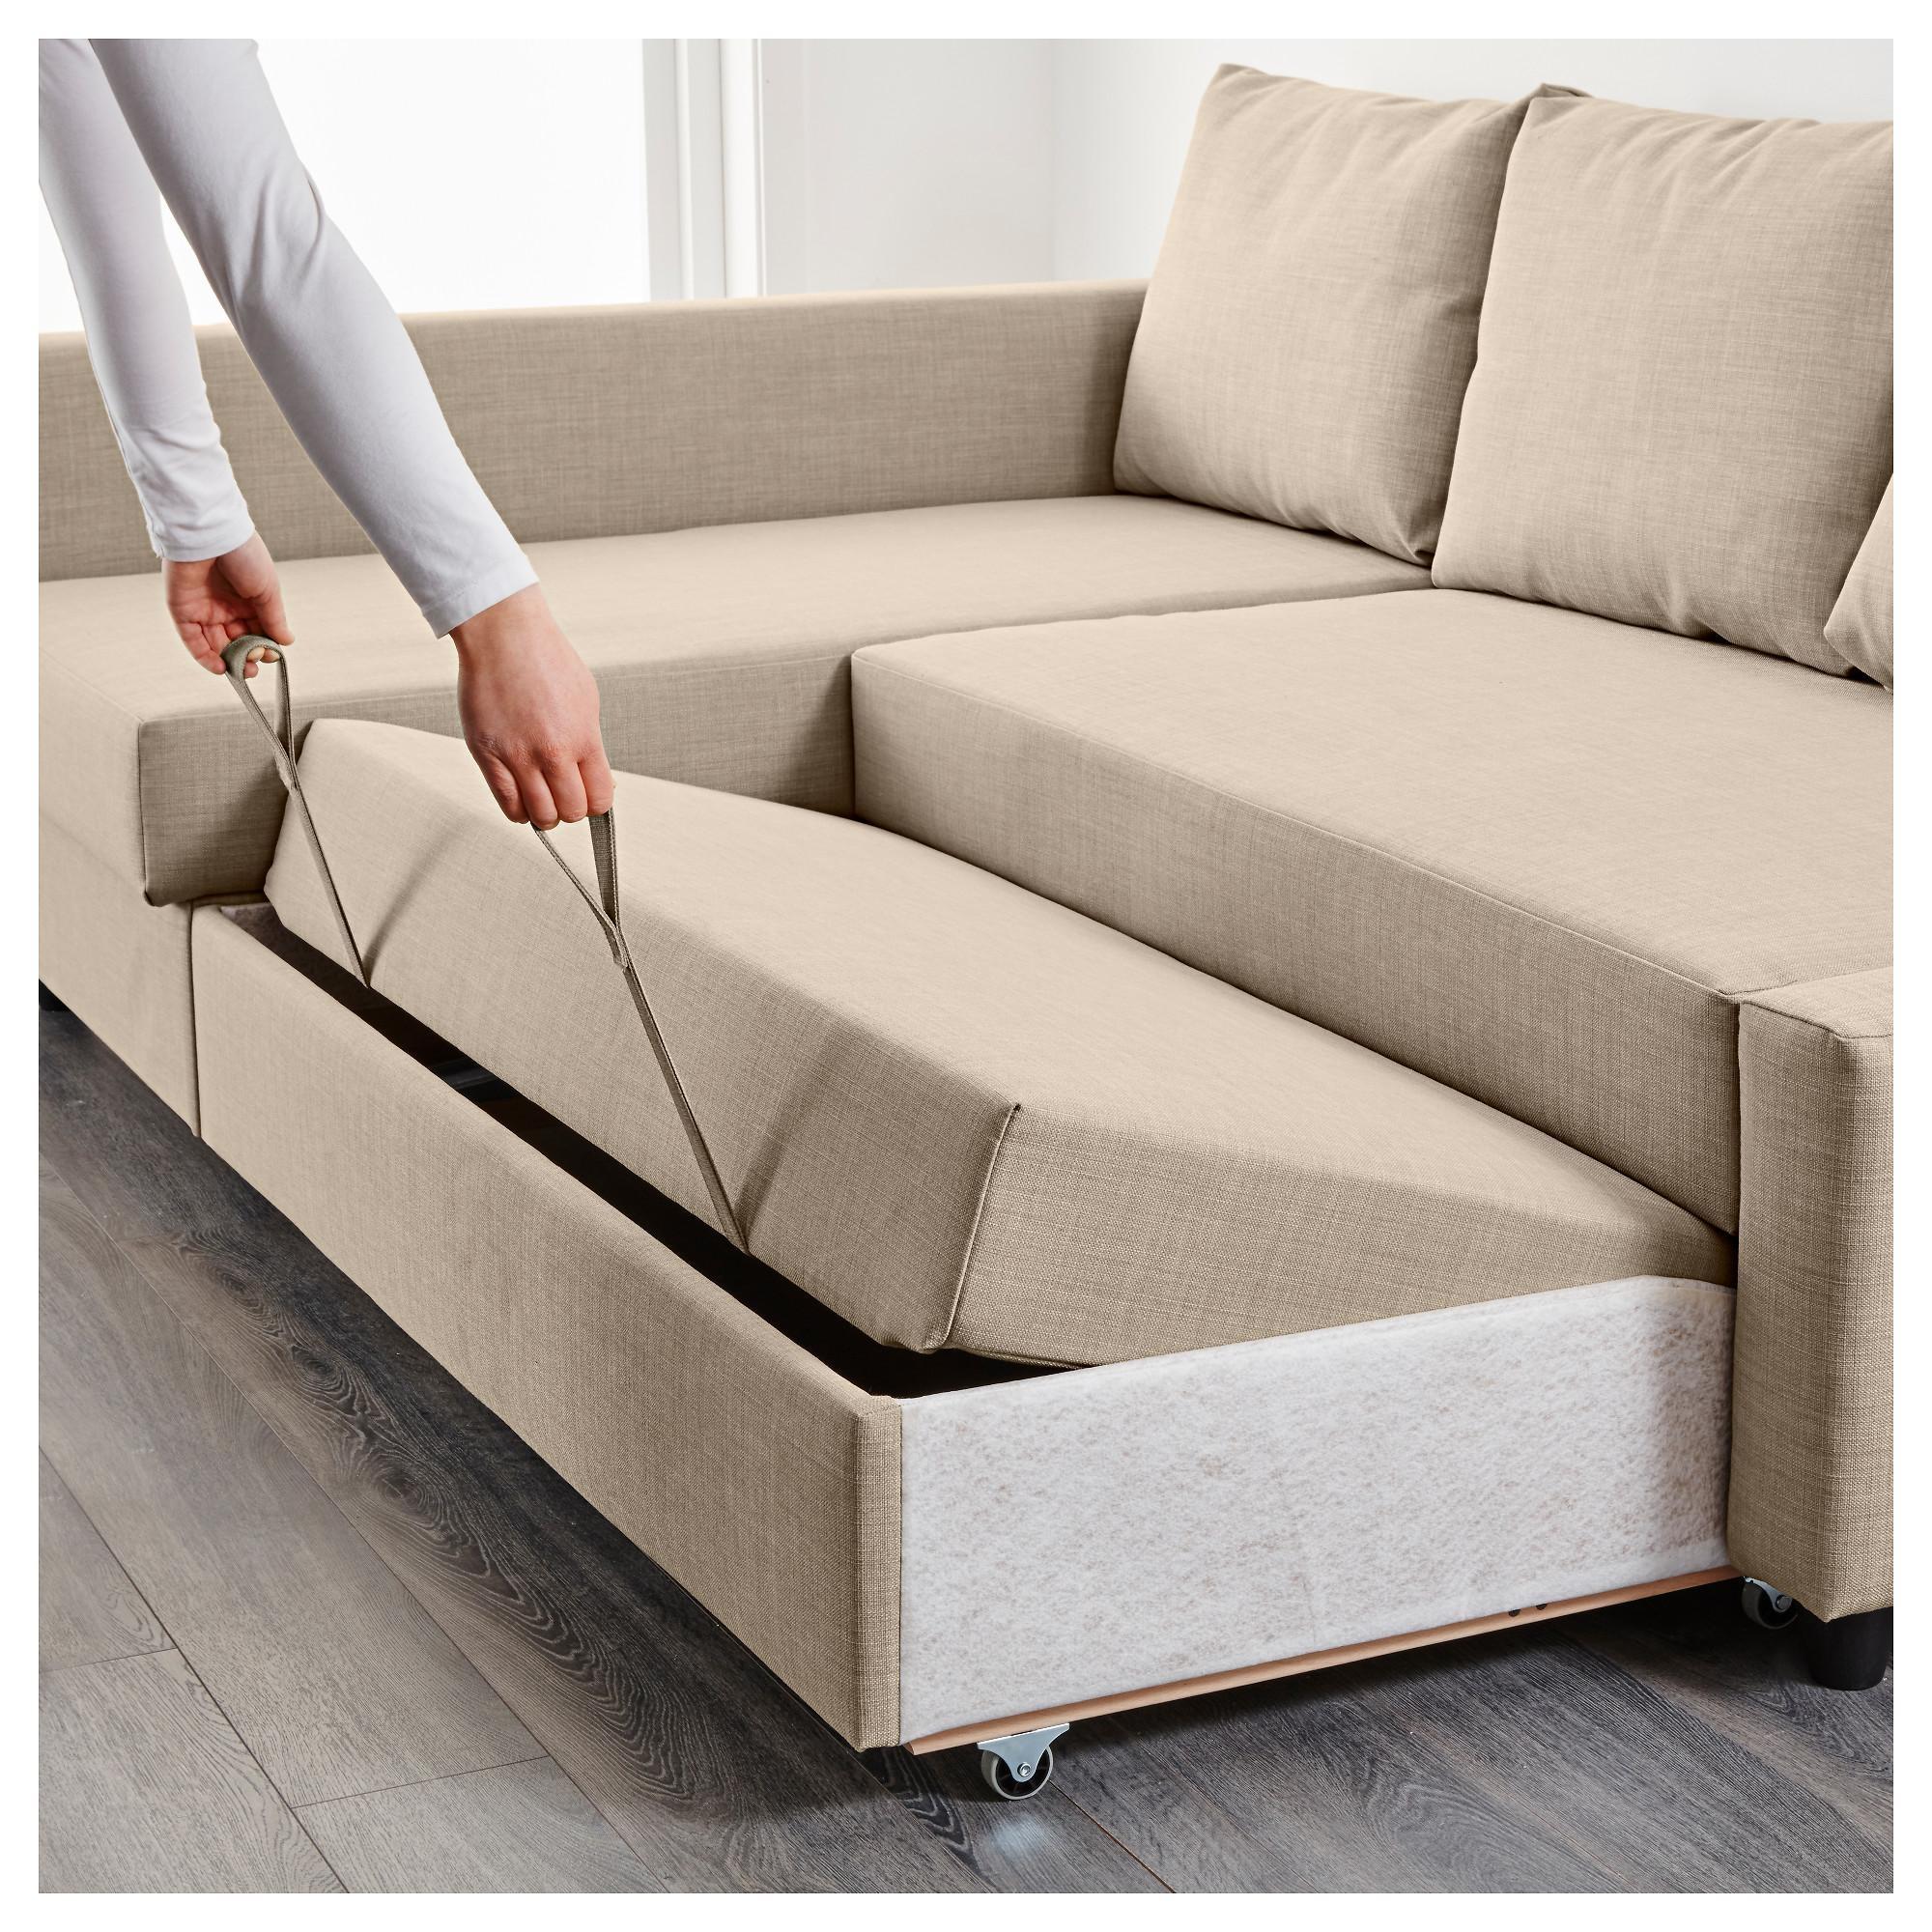 Friheten Corner Sofa Bed With Storage – Skiftebo Dark Gray – Ikea In Corner Sofa Beds (Image 8 of 20)